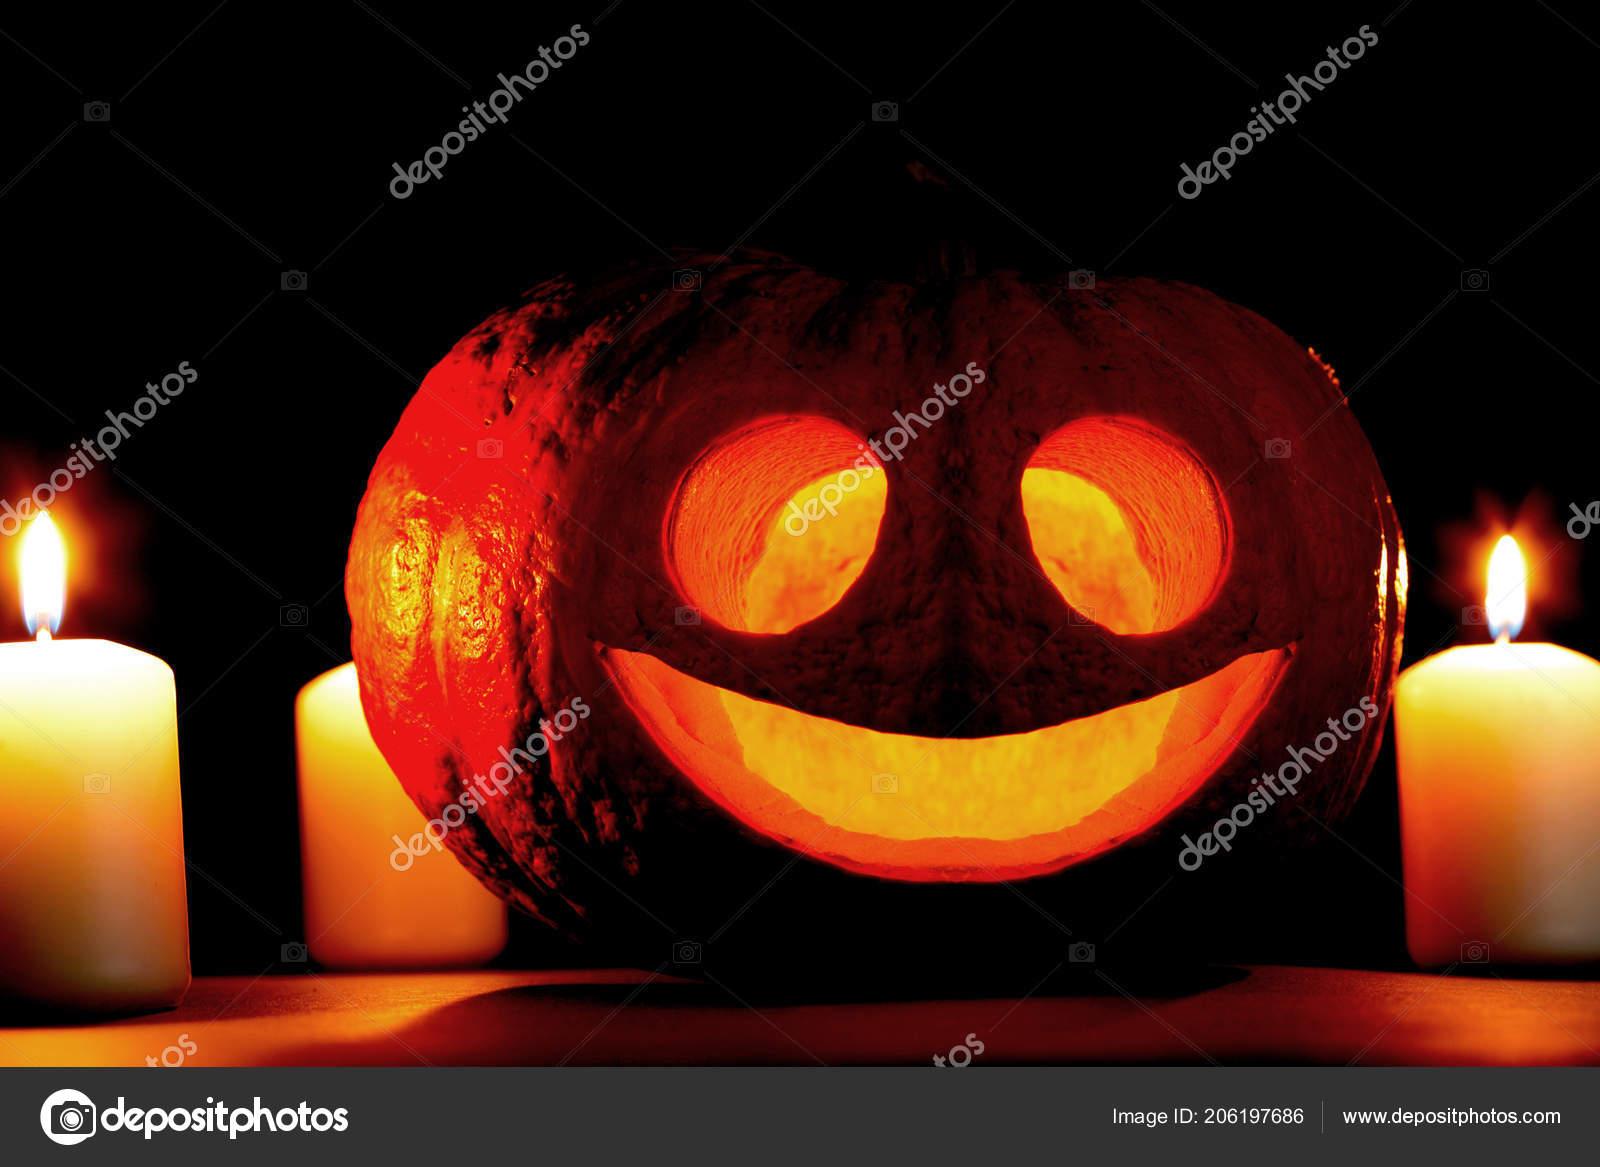 funny halloween pumpkin burning candles black background stock